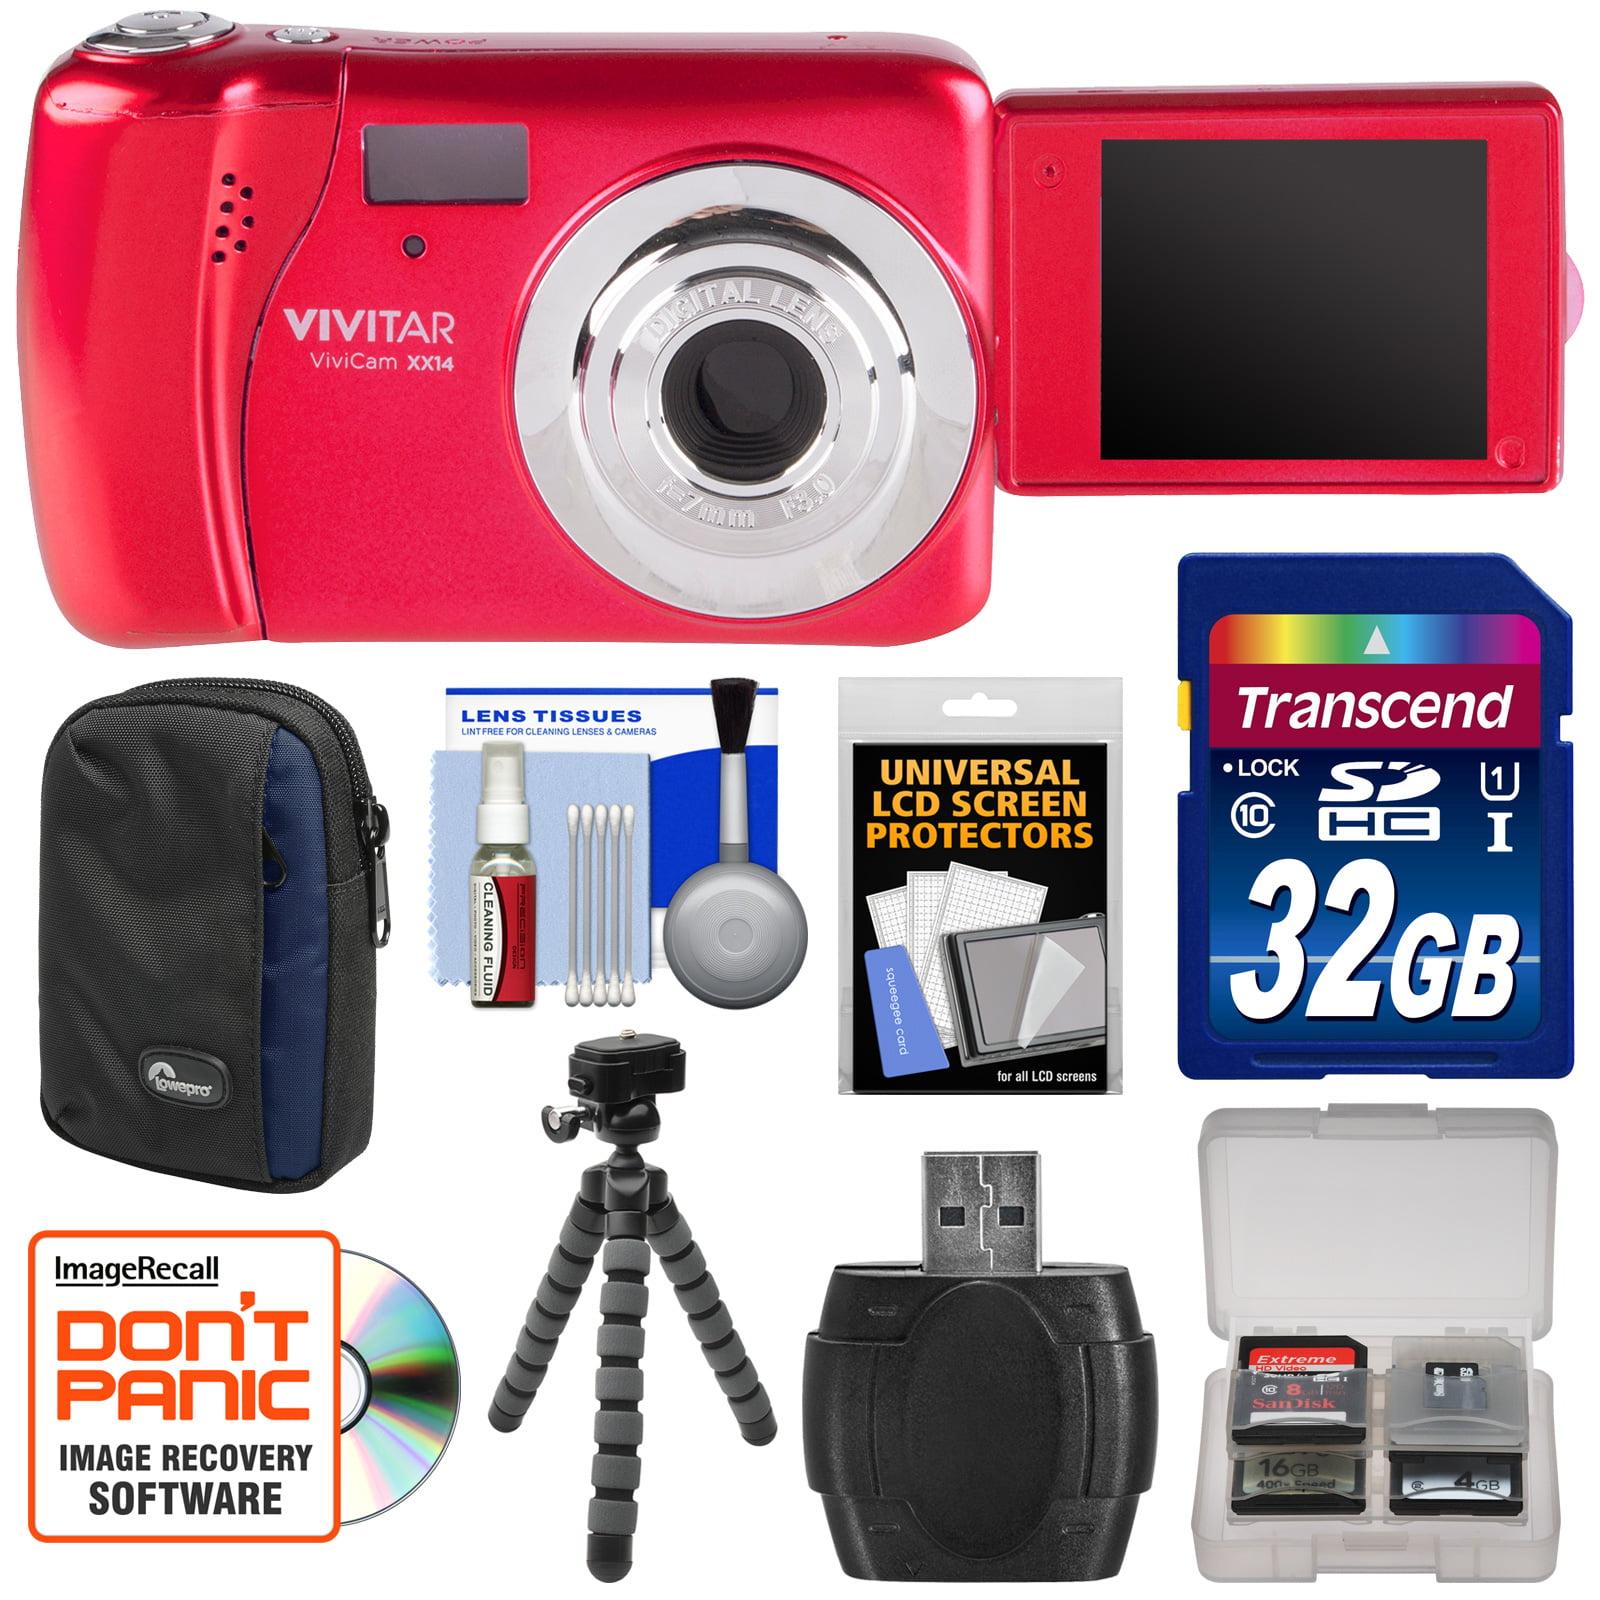 Vivitar ViviCam VXX14 Selfie Digital Camera (Red) with 32GB Card + Case + Flex Tripod + Reader + Kit by Vivitar